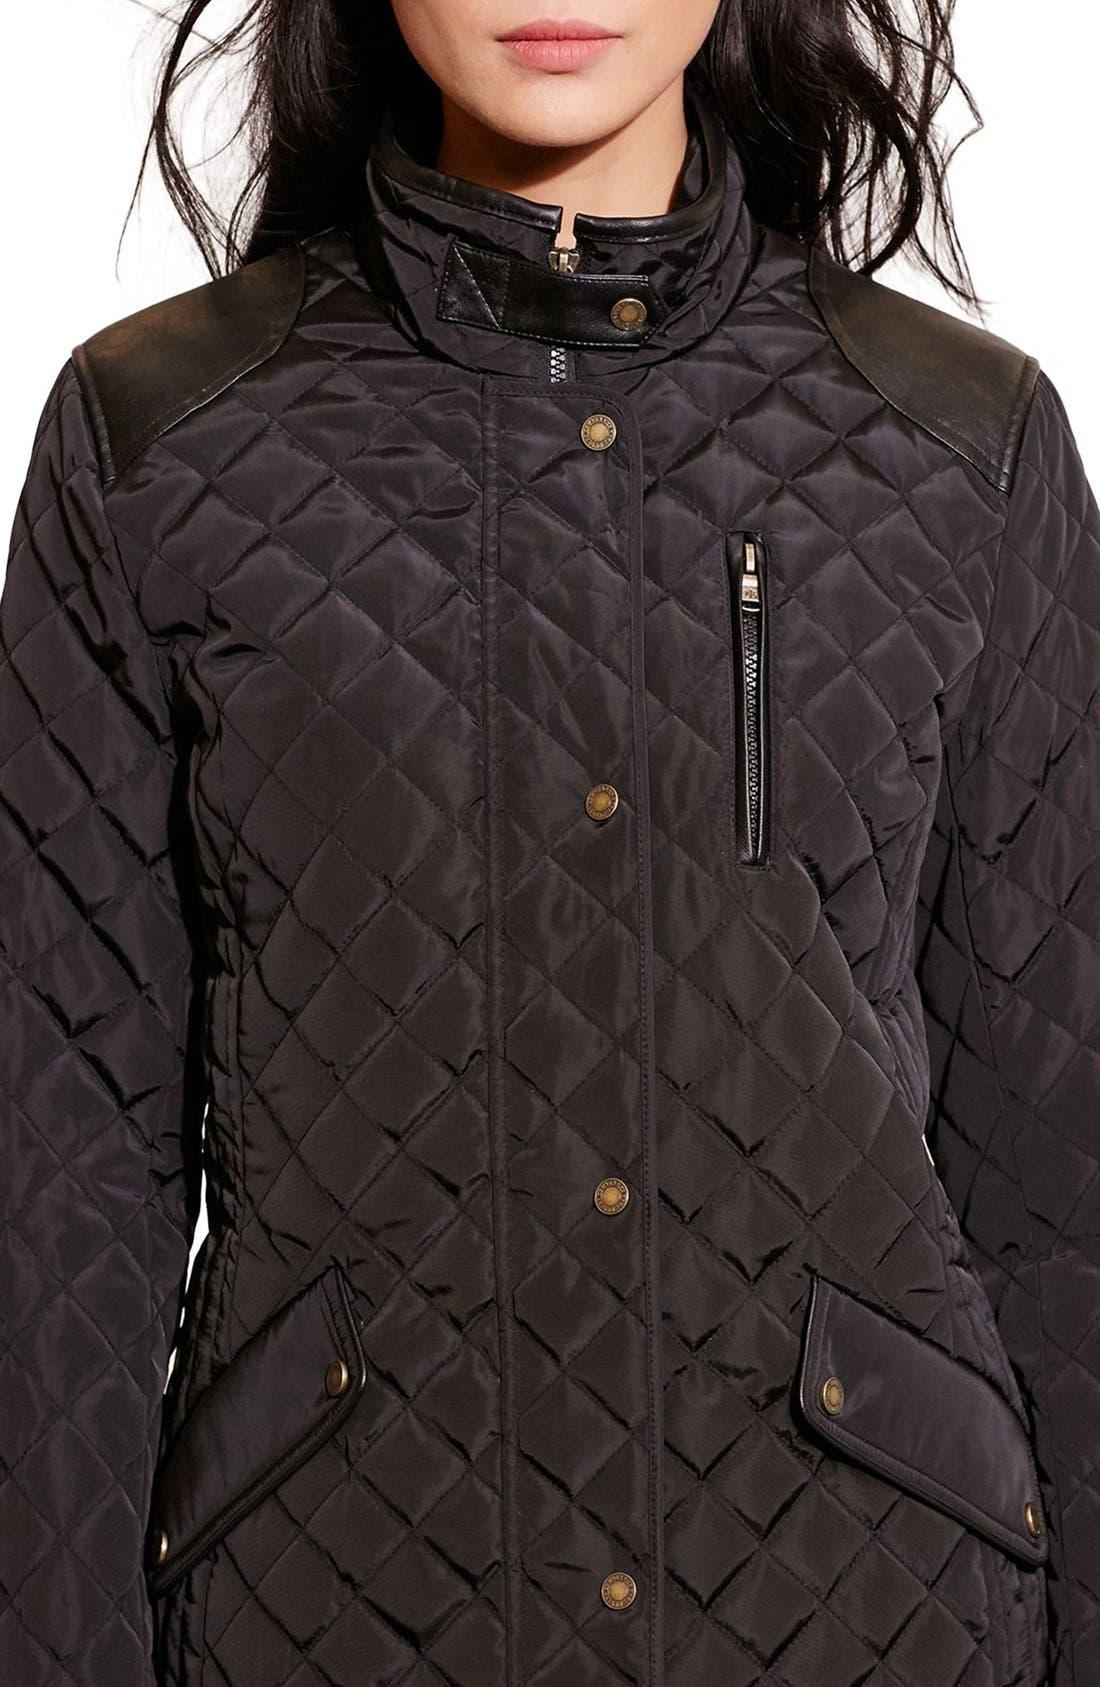 Alternate Image 3  - Lauren Ralph Lauren Diamond Quilted Jacket with Faux Leather Trim (Regular & Petite)